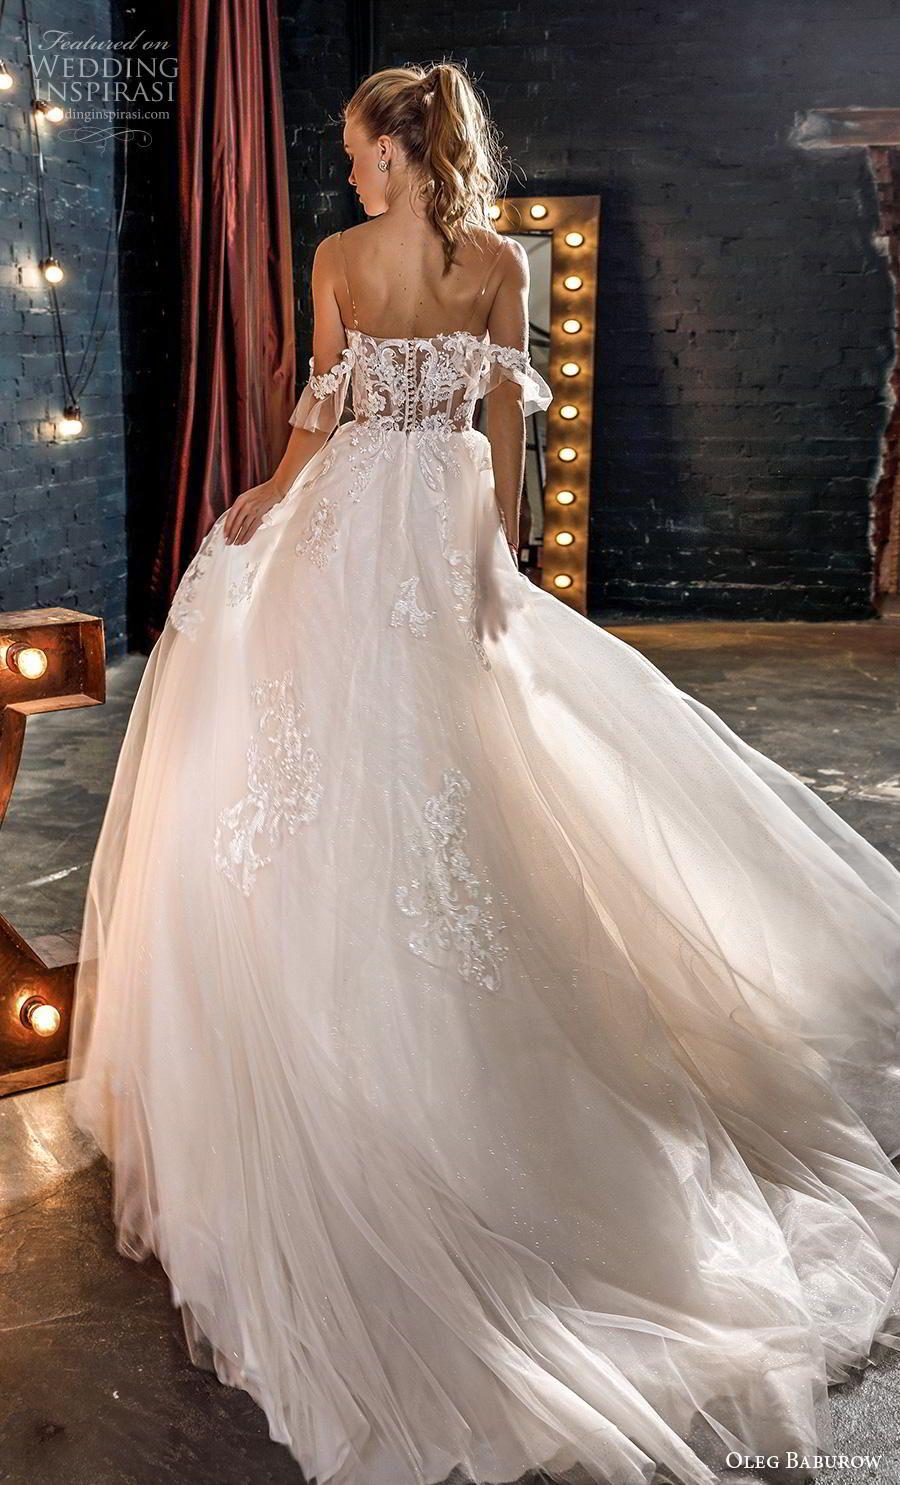 Oleg baburow 2020 star girl wedding dresses wedding